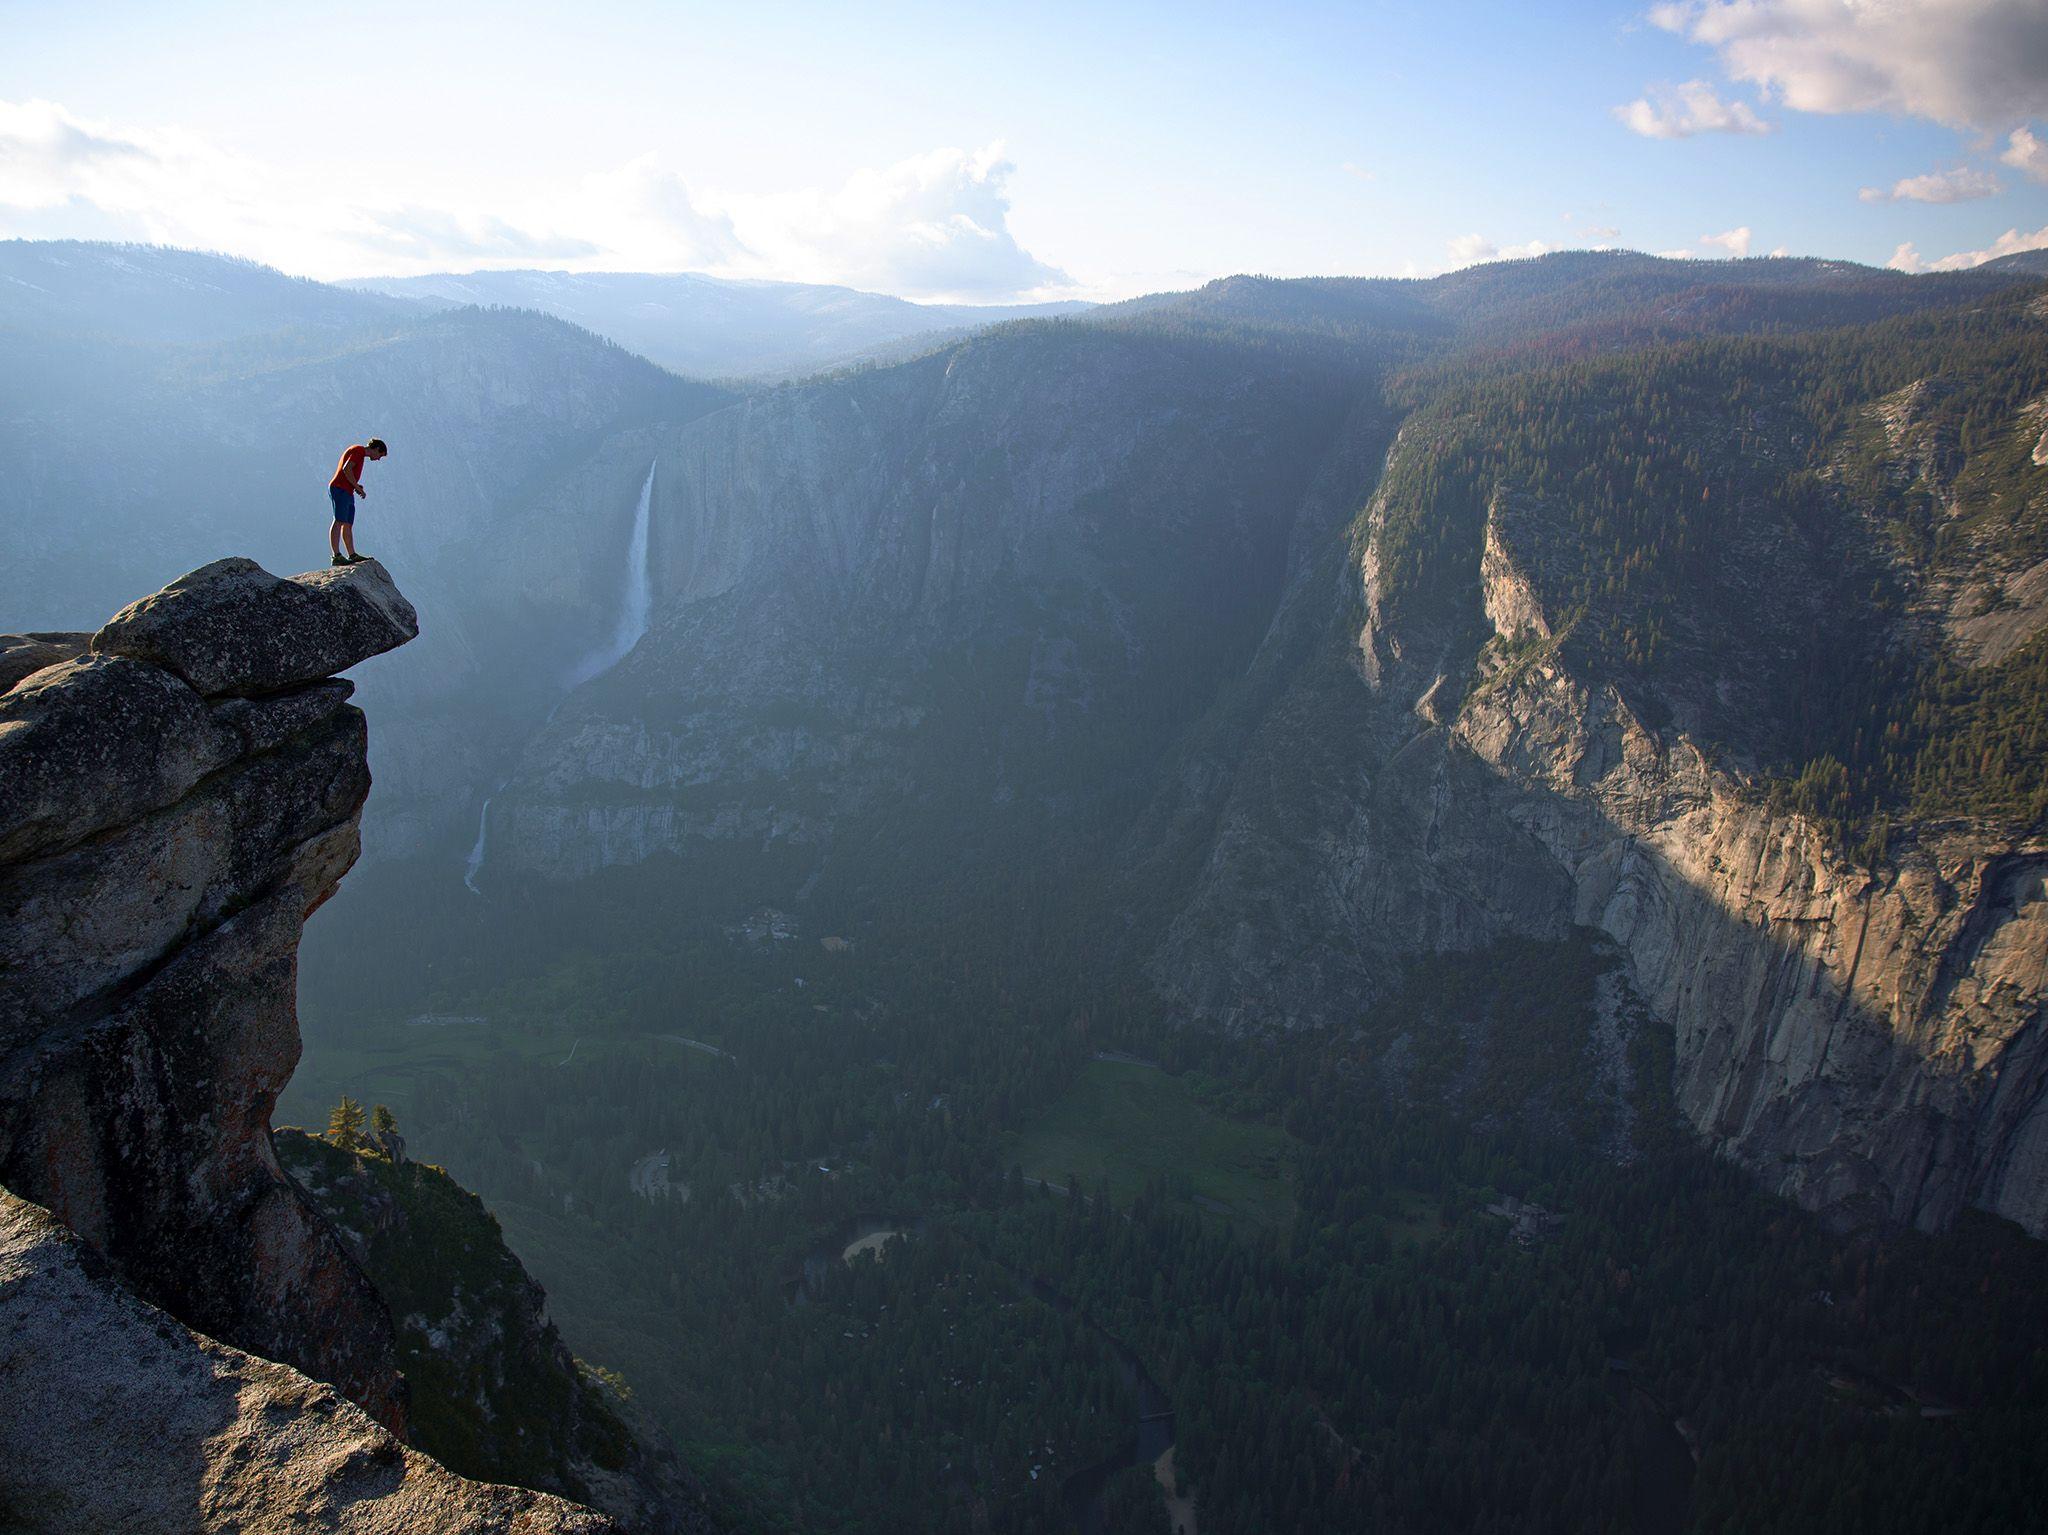 Alex Honnold peers over the edge of Glacier Point in Yosemite National Park. He had just climbed... [Foto del giorno - marzo 2019]